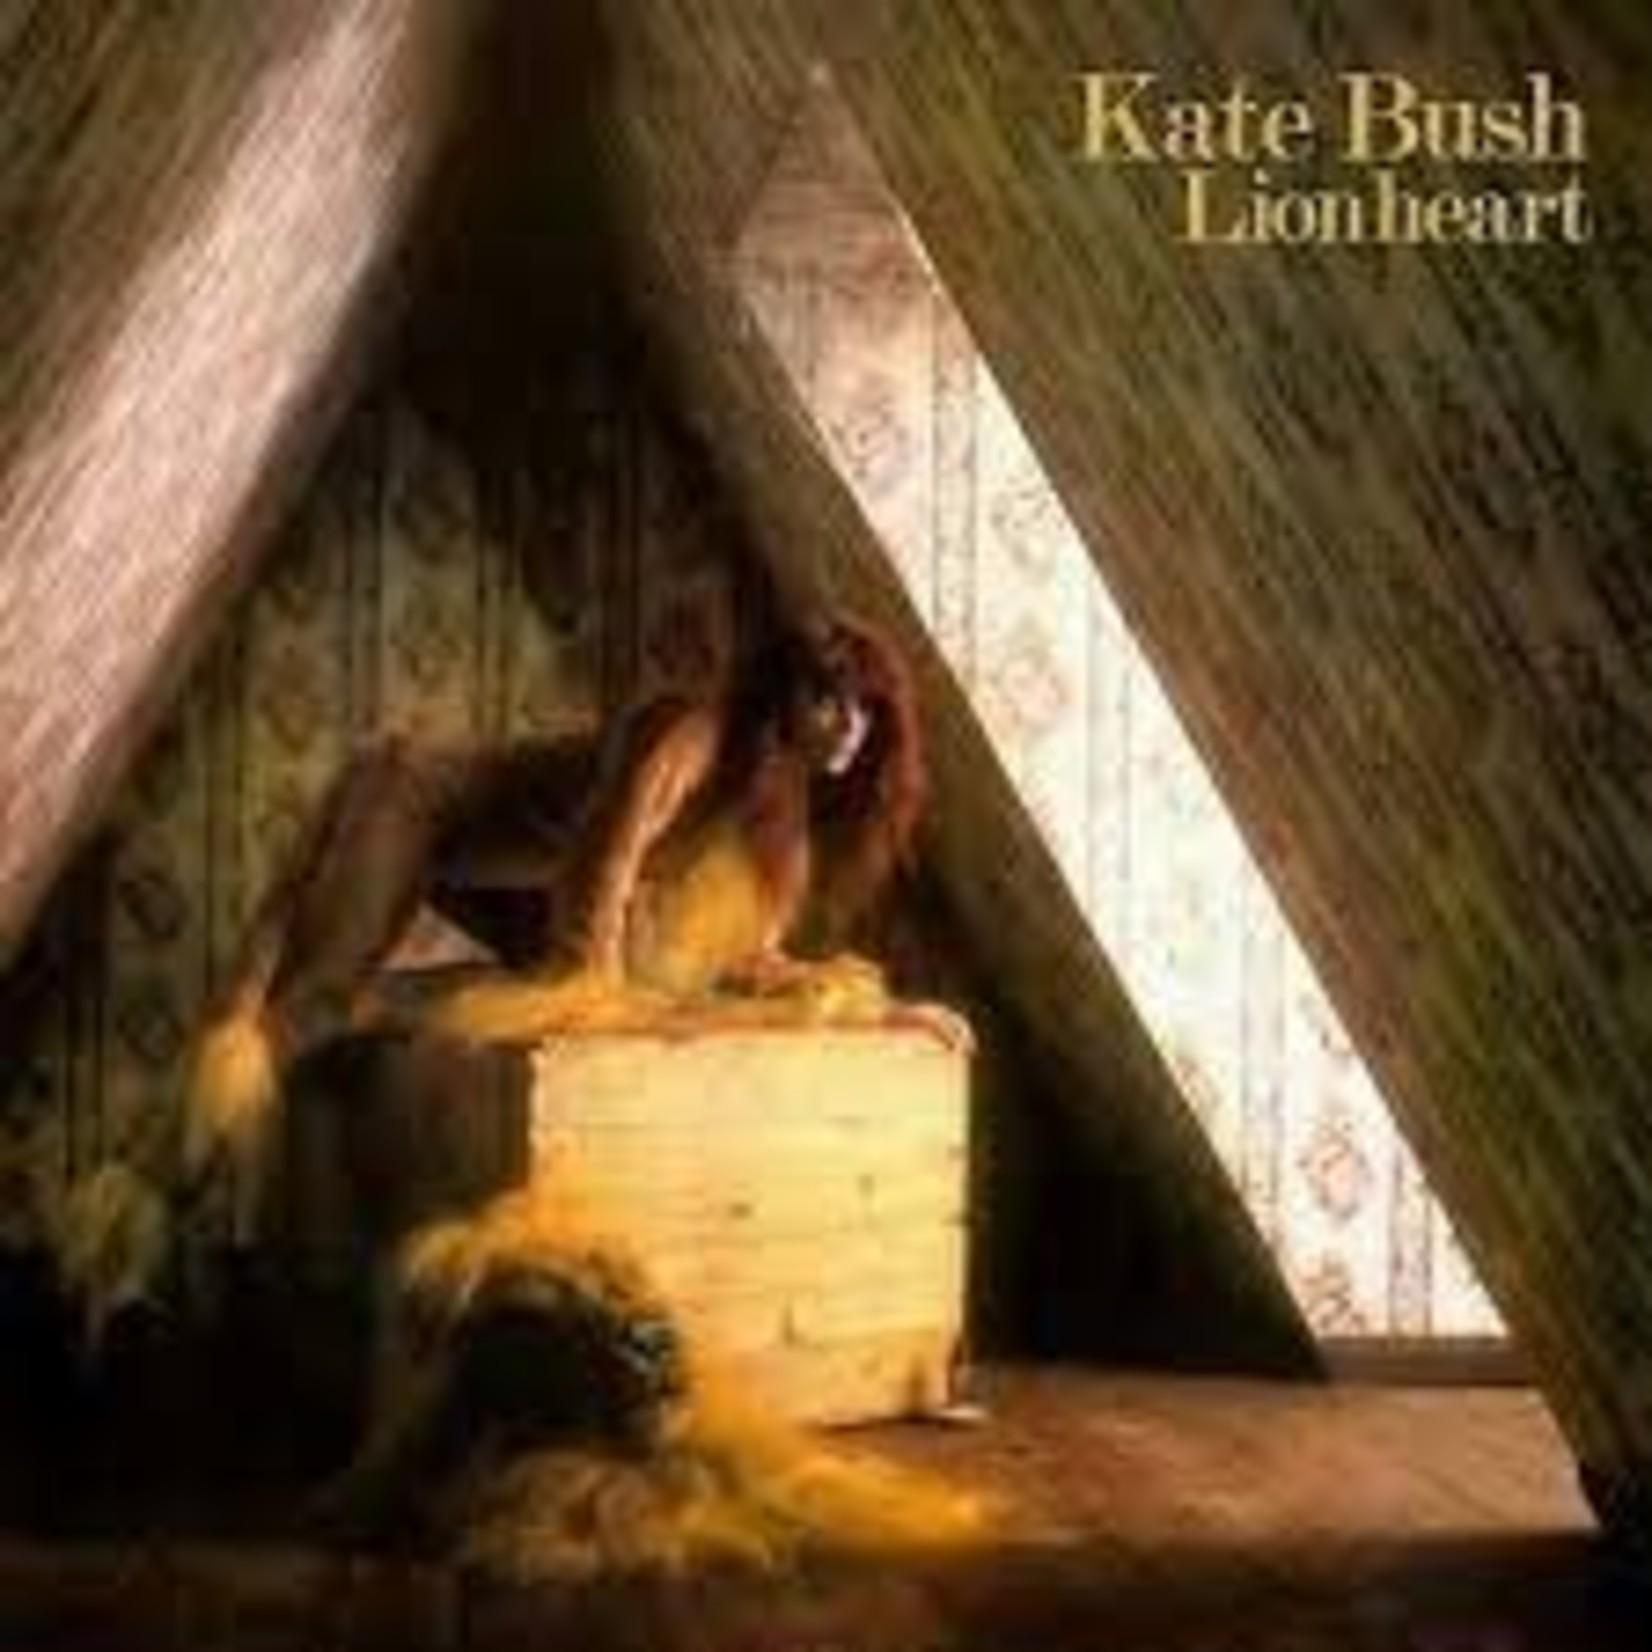 KATE BUSH - LIONHART (VINYL)